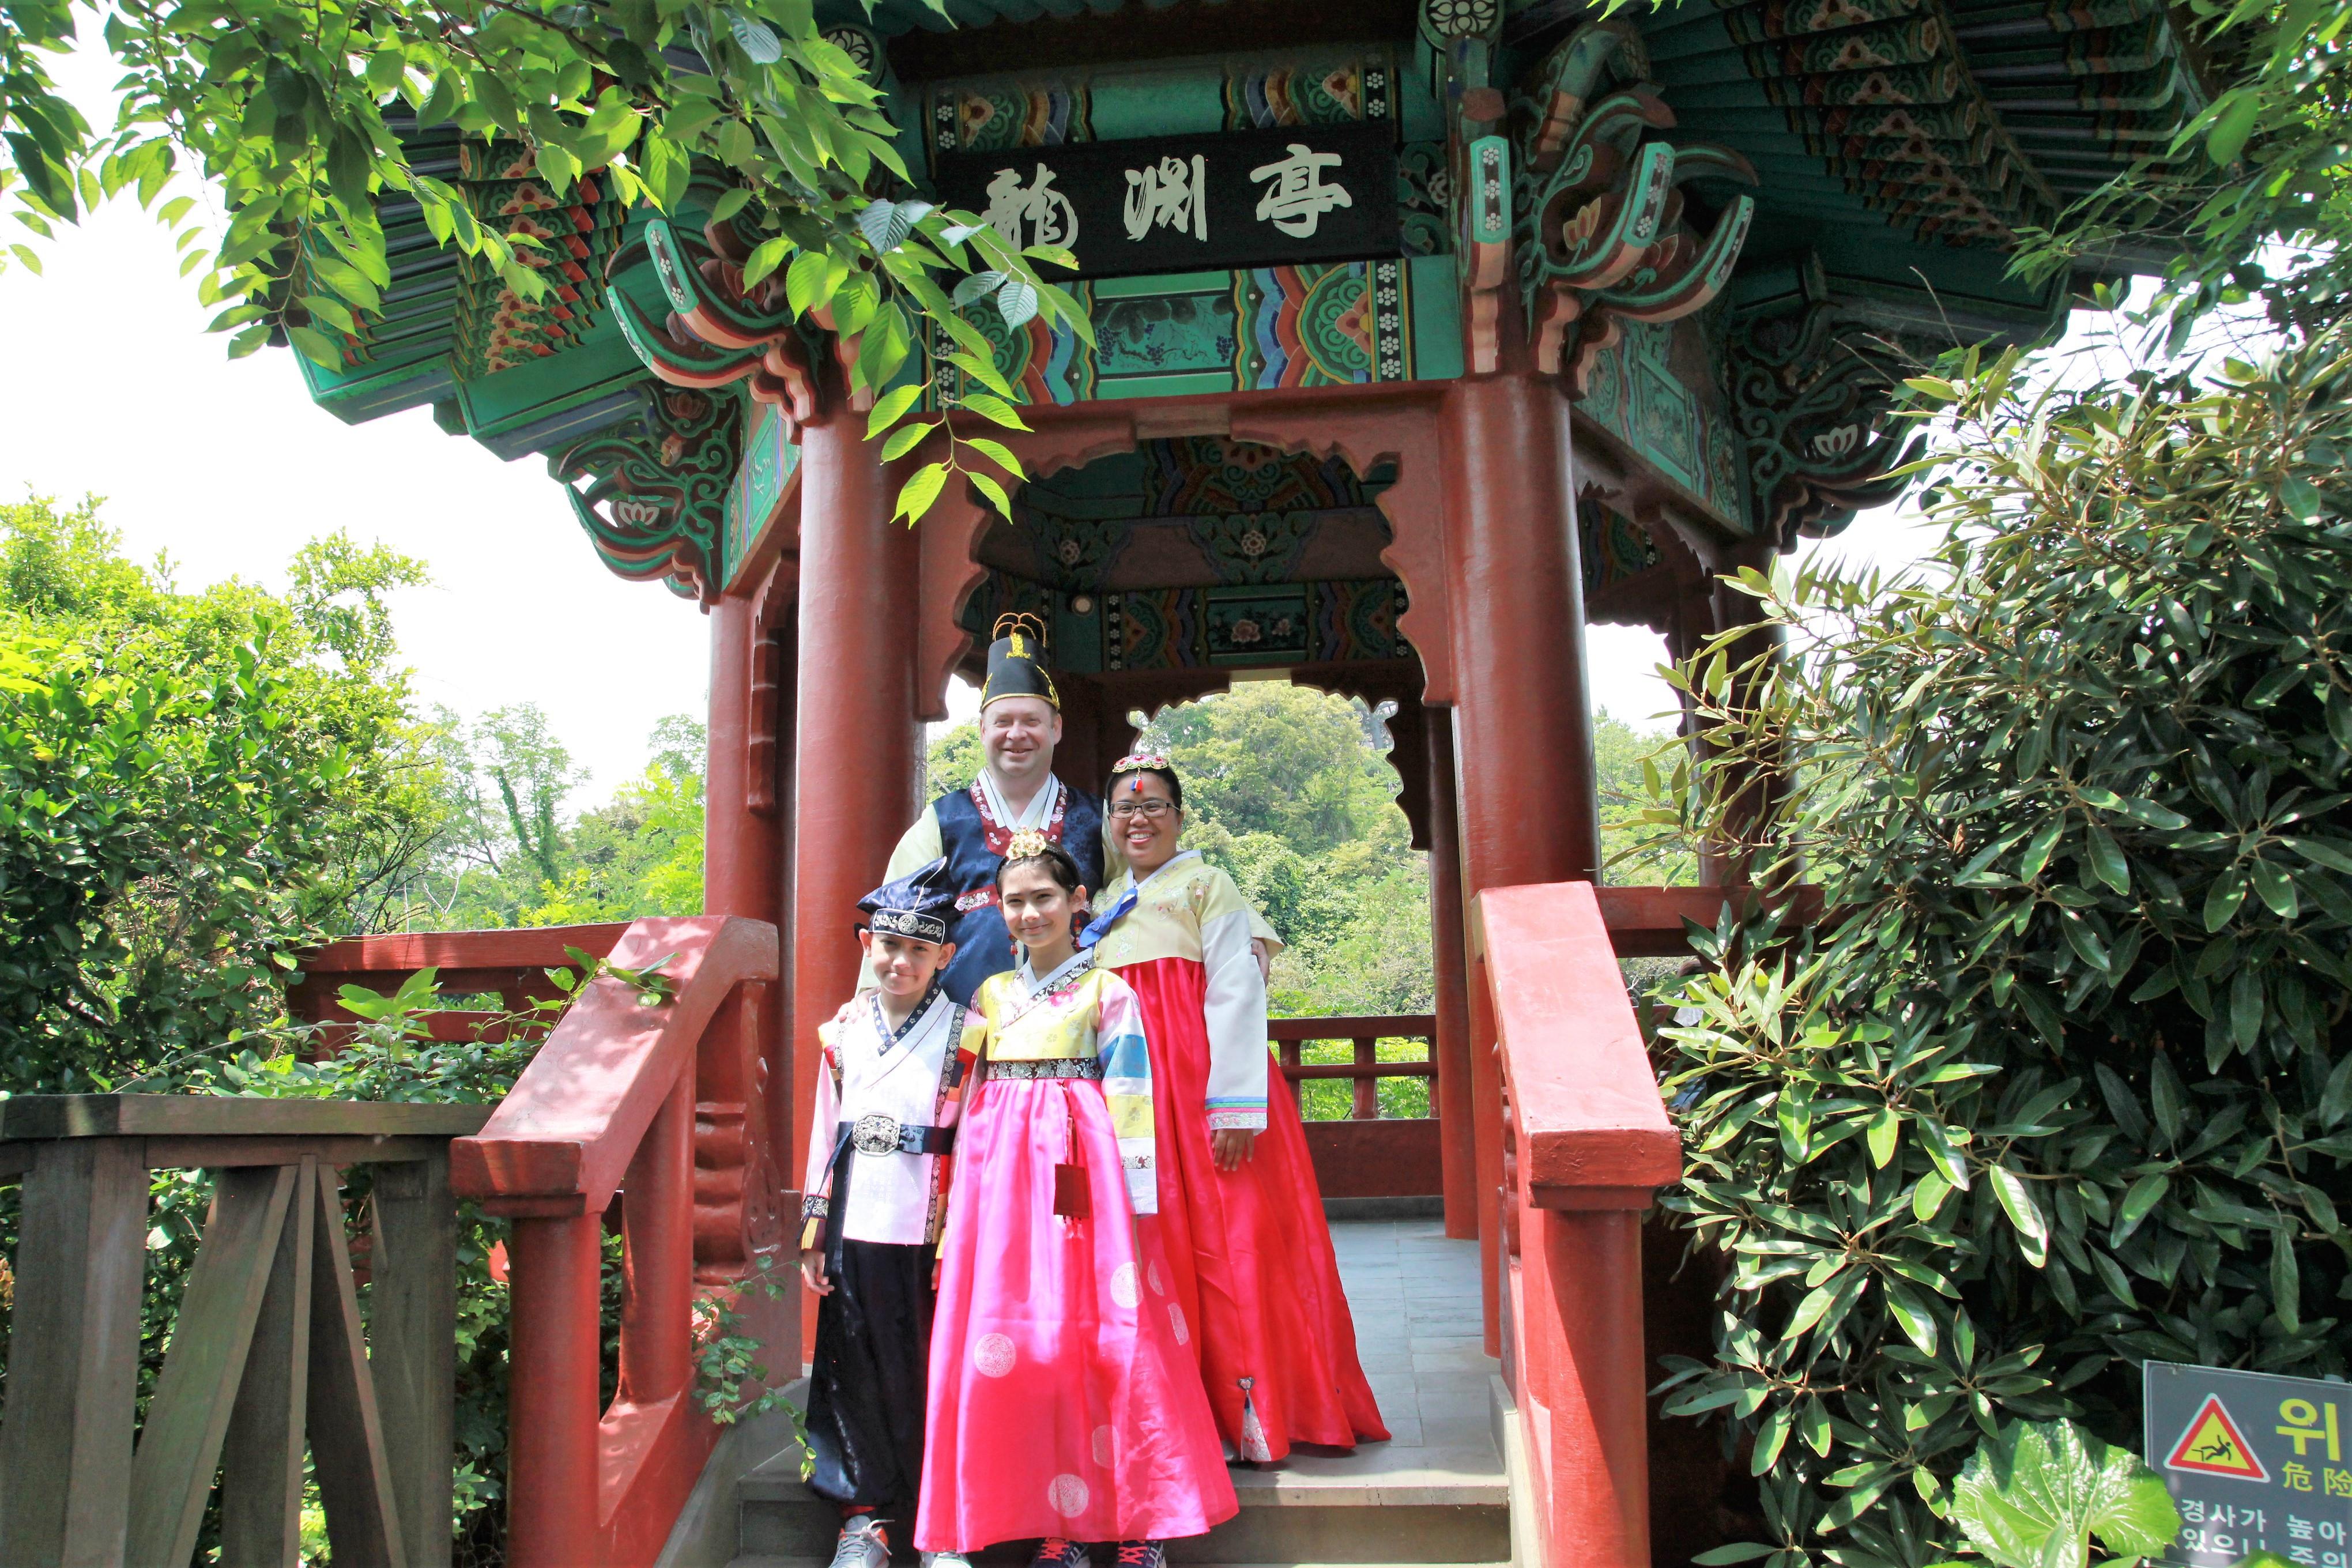 [Adult] Hanbok Rental for full day